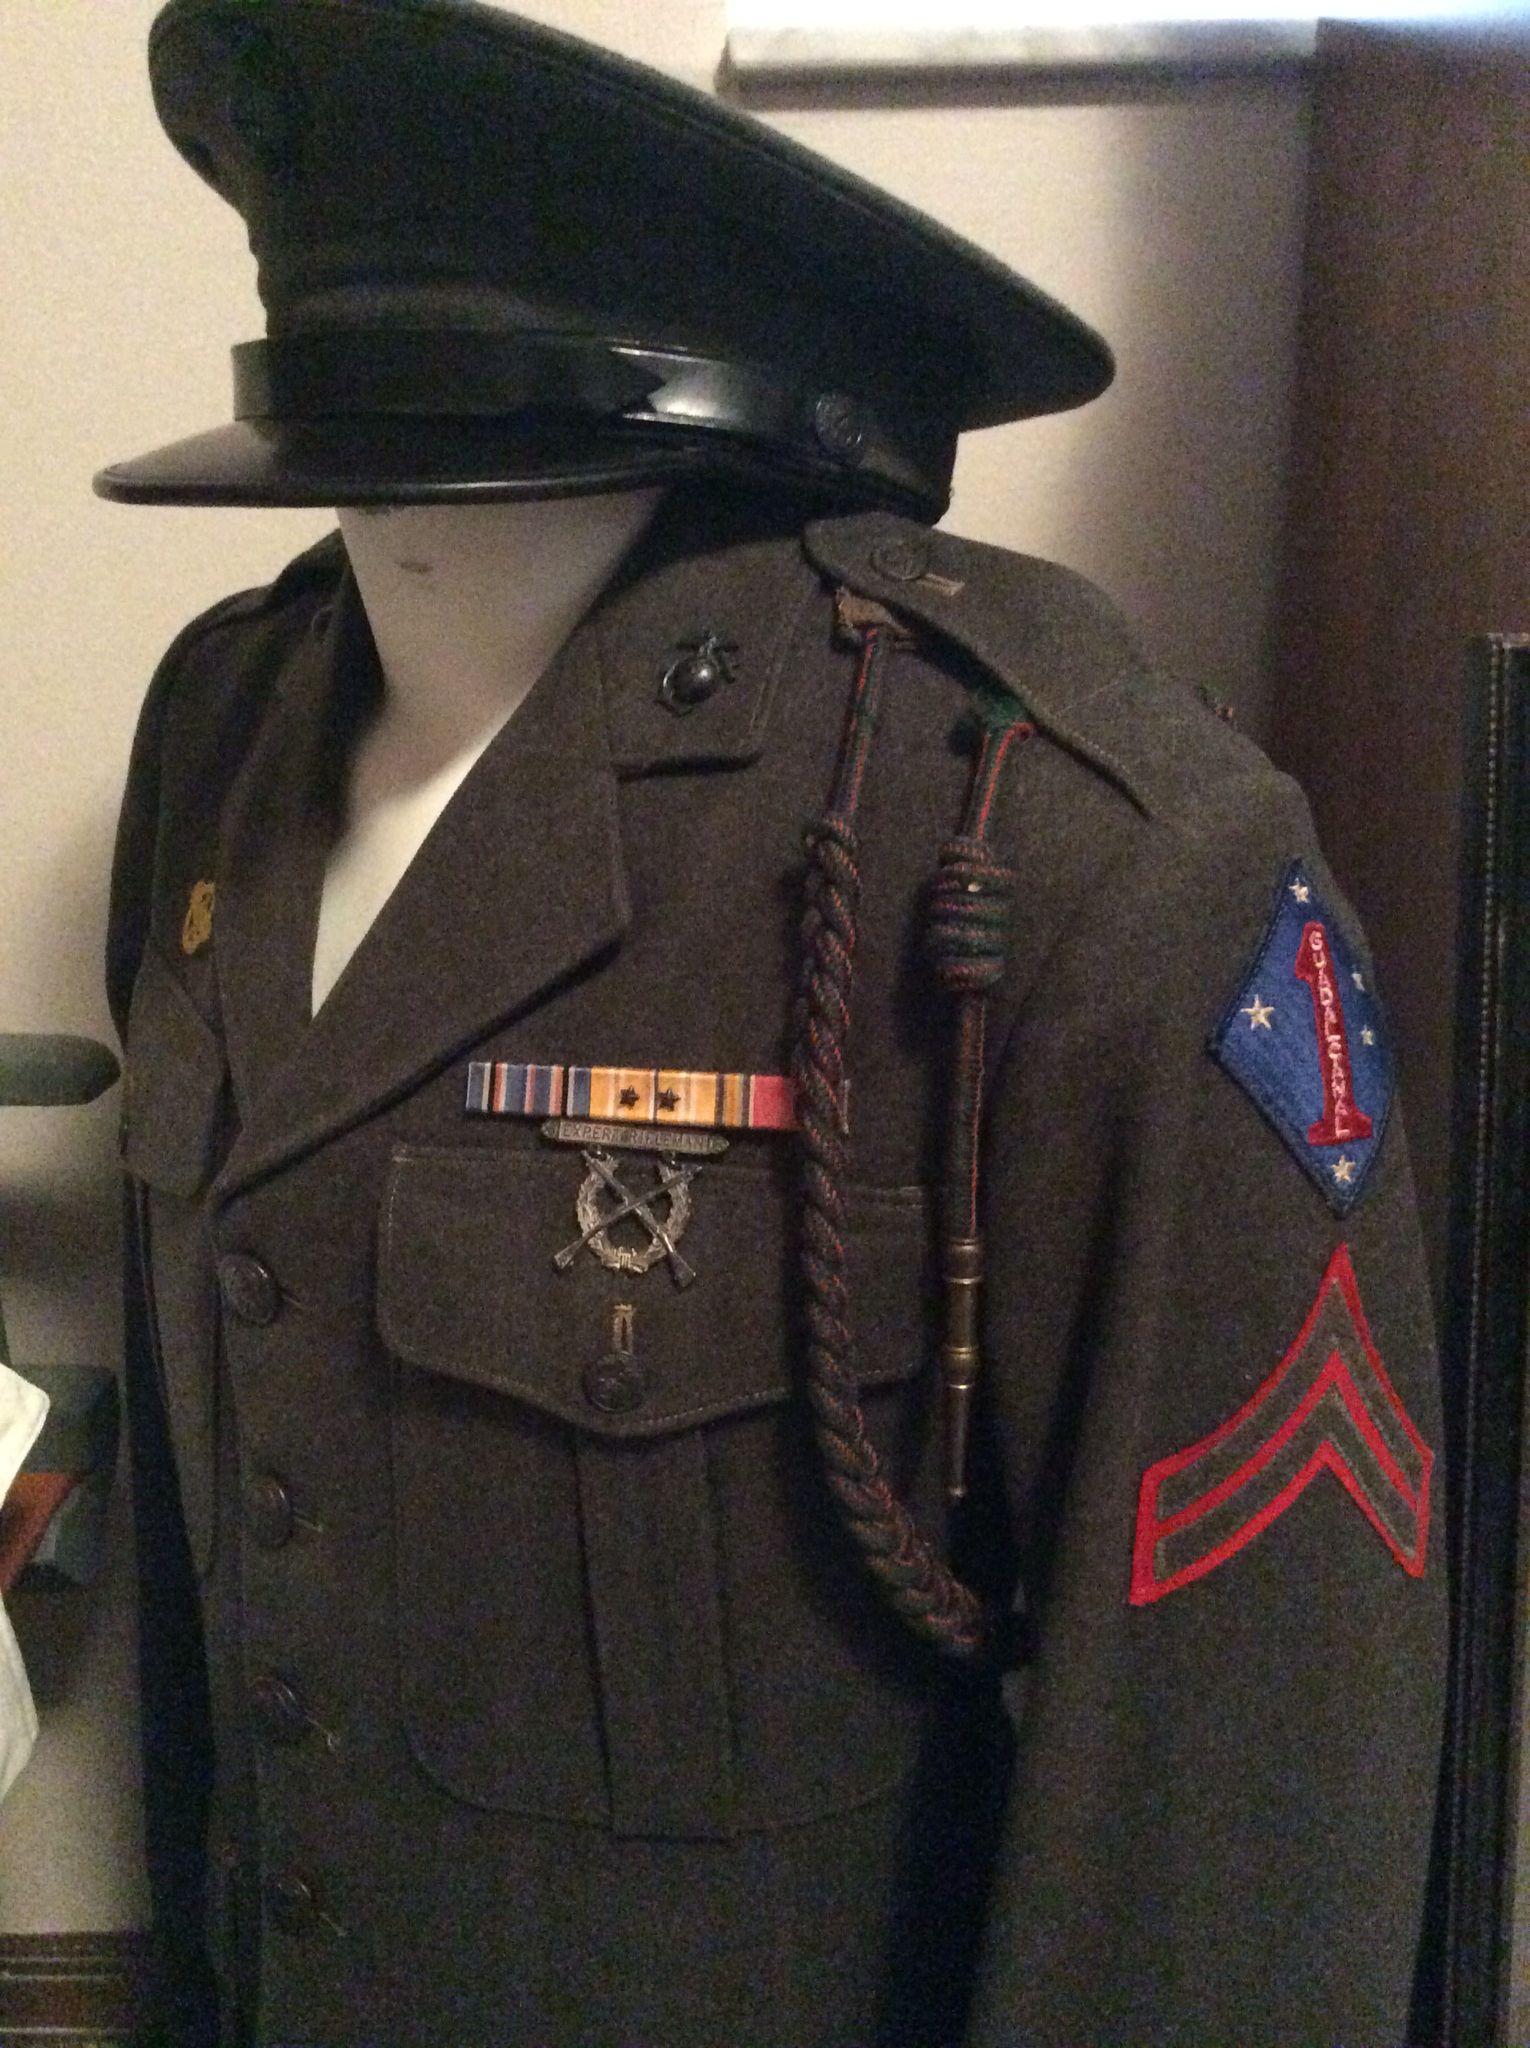 Usmc Service A Uniform 72